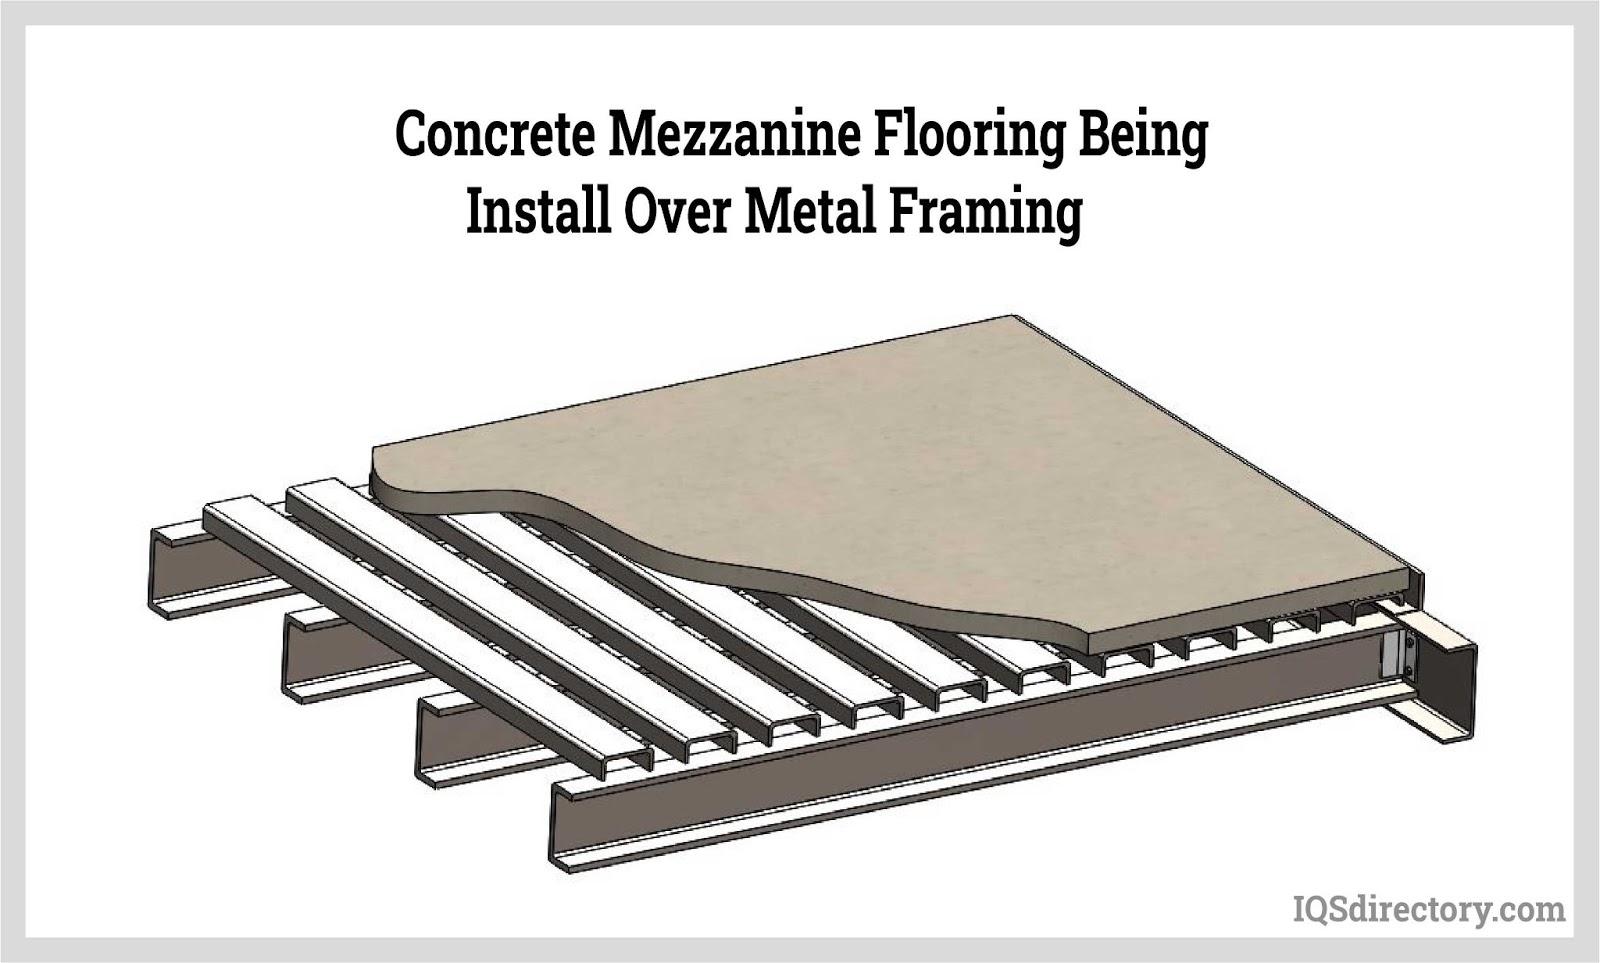 Concrete Mezzanine Flooring Installation Over Metal Framing